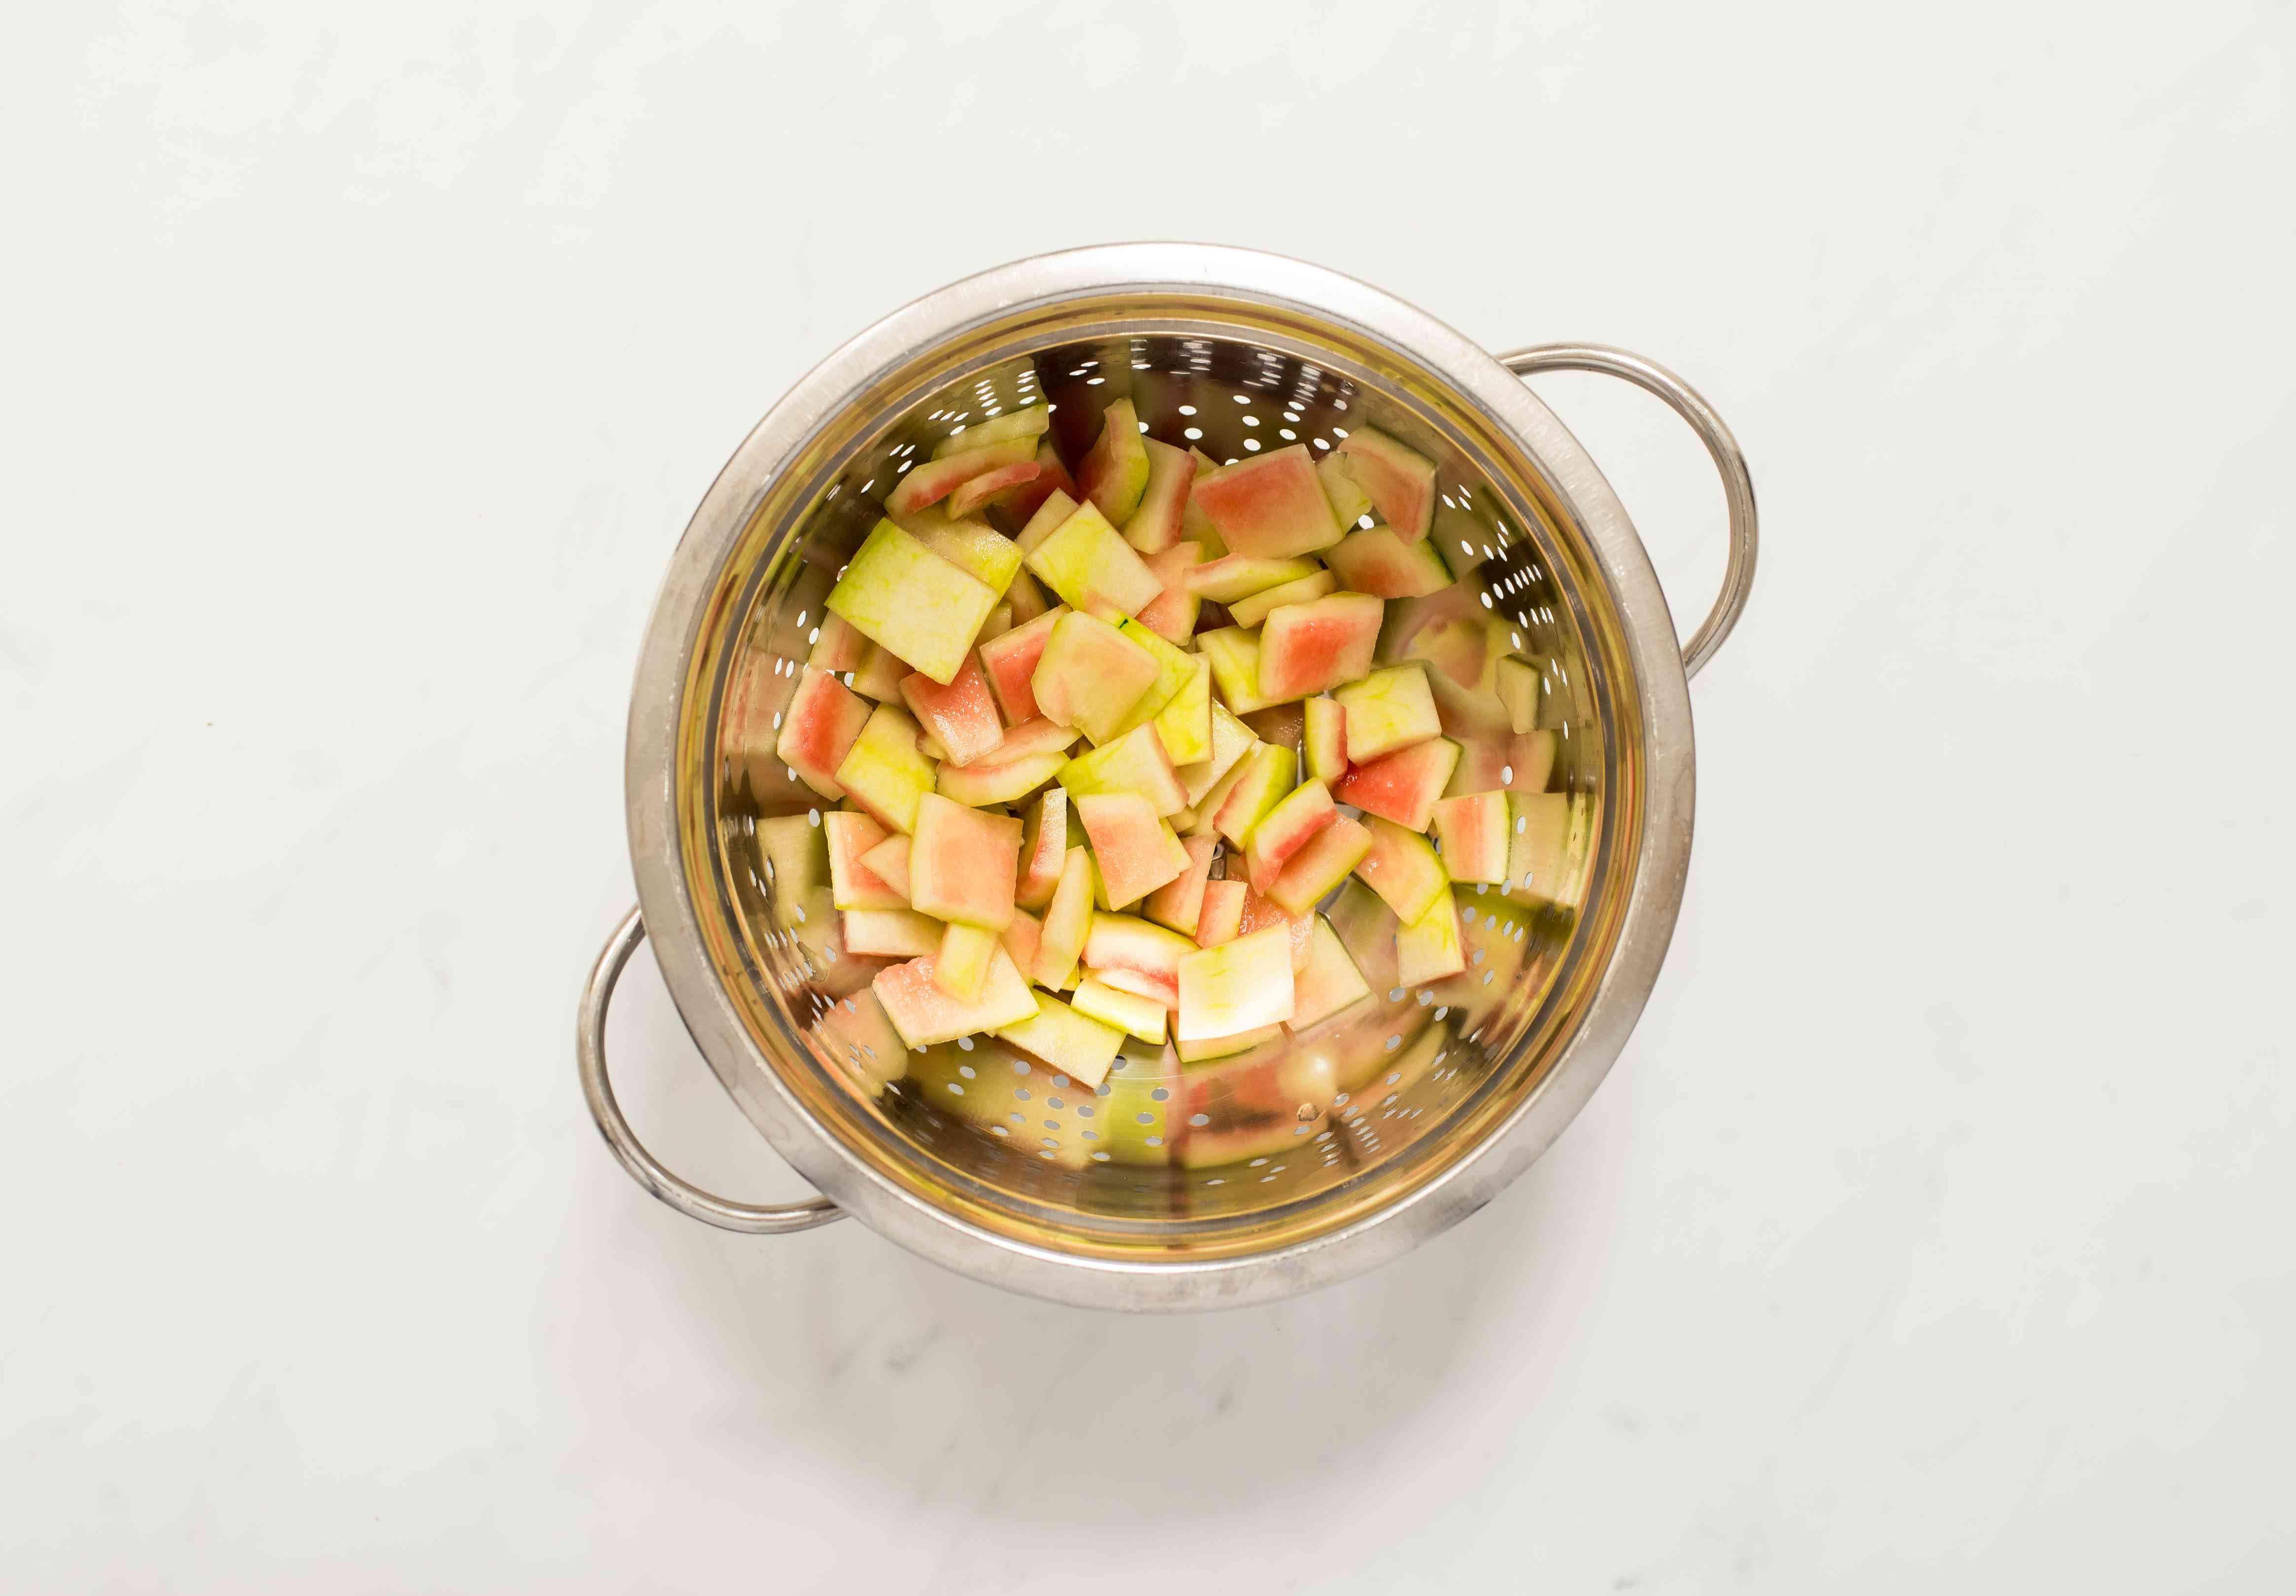 Watermelon rind in a colander